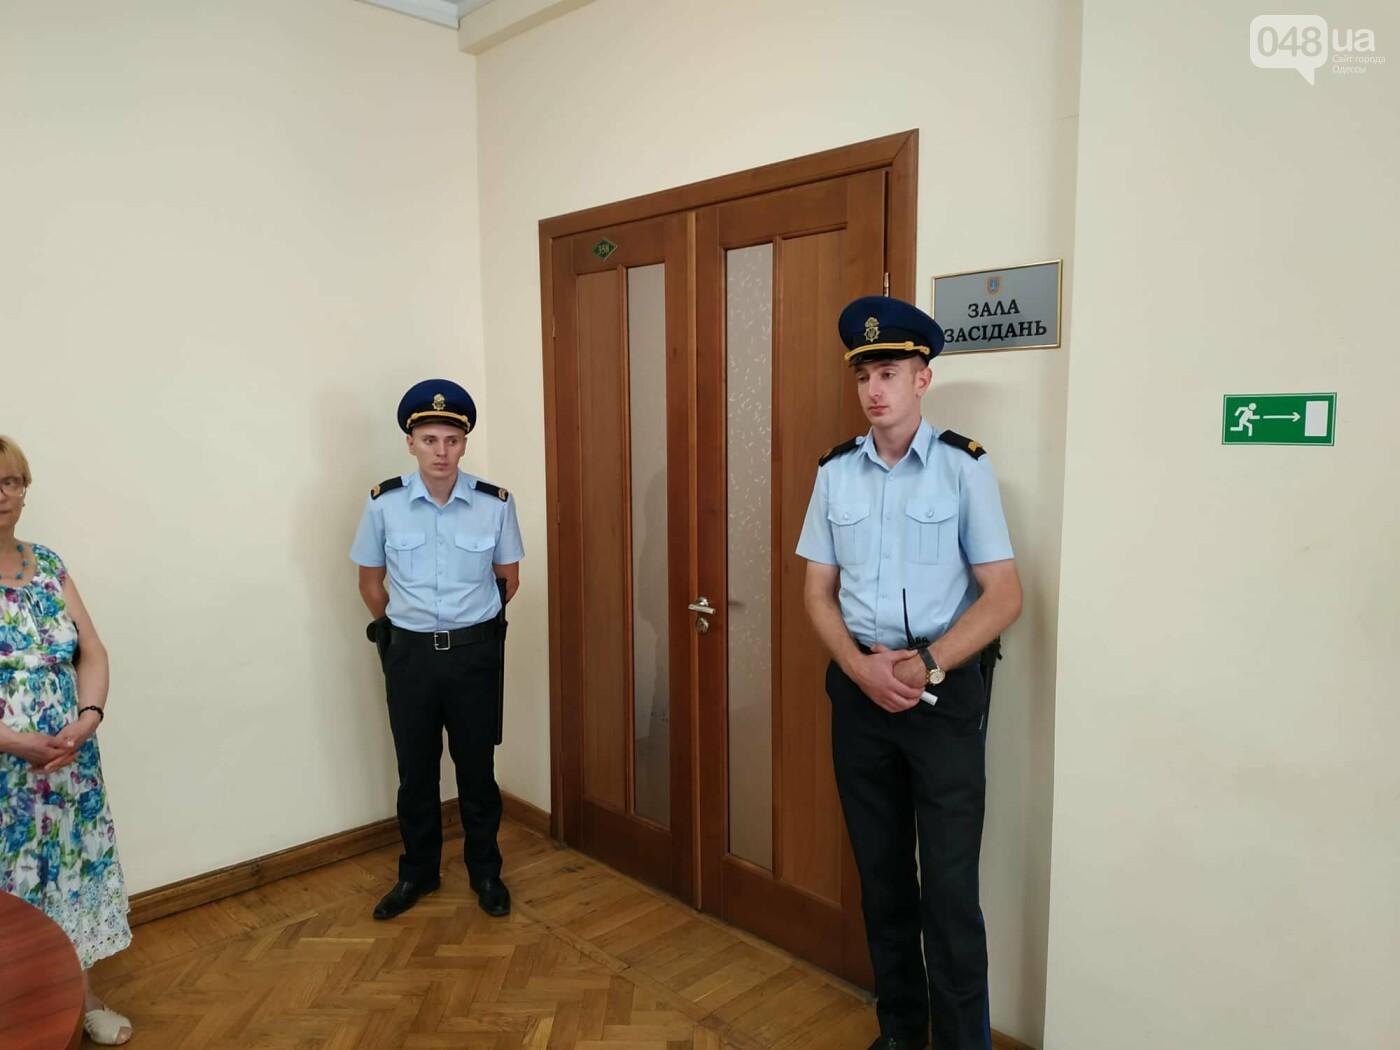 Стало известно, кто возглавил Одесский областной совет, - ФОТО, фото-14, Фото: Александр Жирносенко